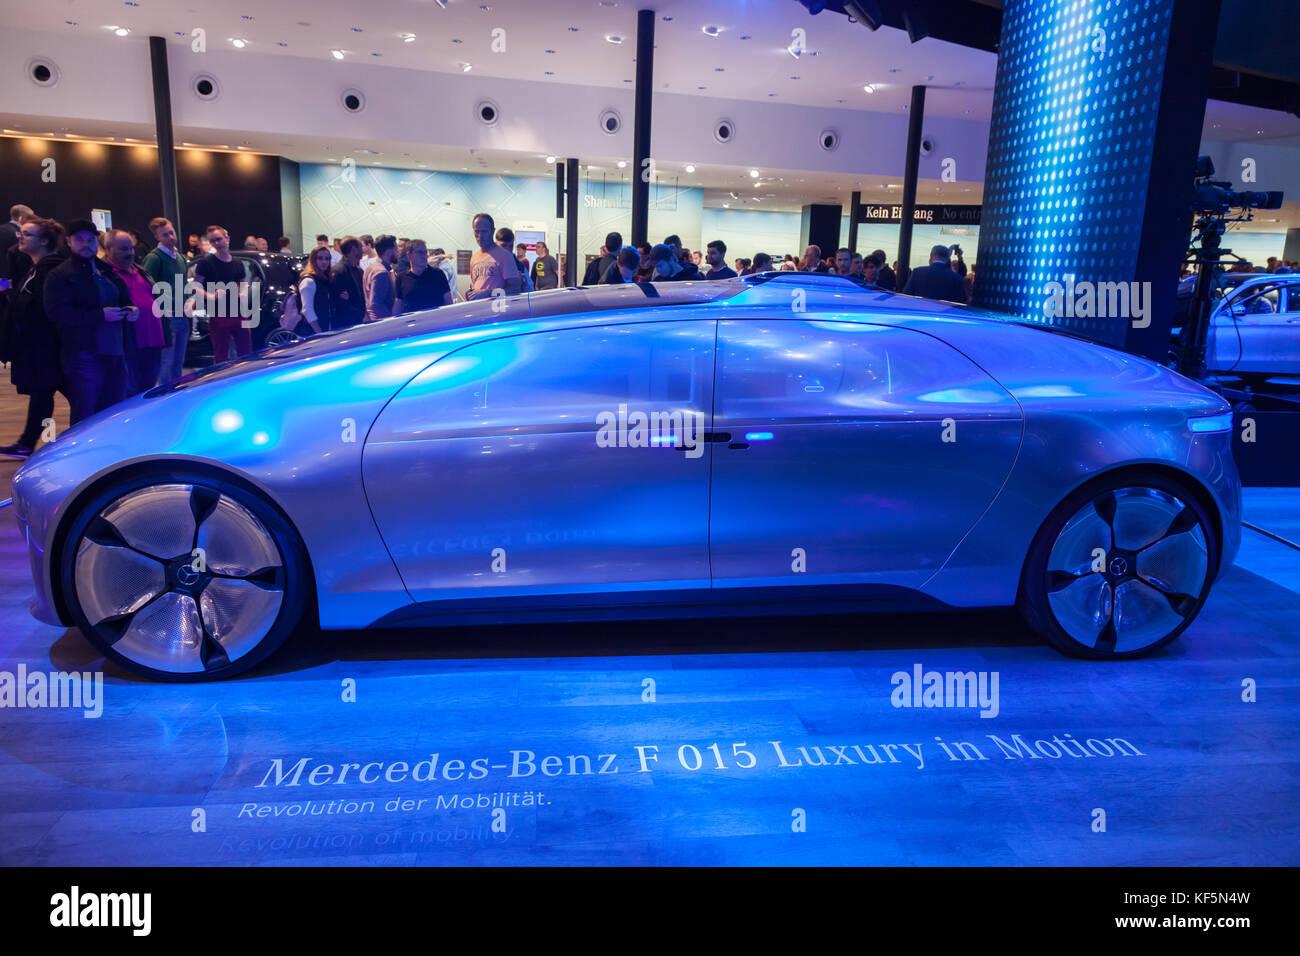 Frankfurt, Germany - Sep 20, 2017: Mercedes Benz F 015 Luxury Electric Car at the Frankfurt International Motorshow - Stock Image